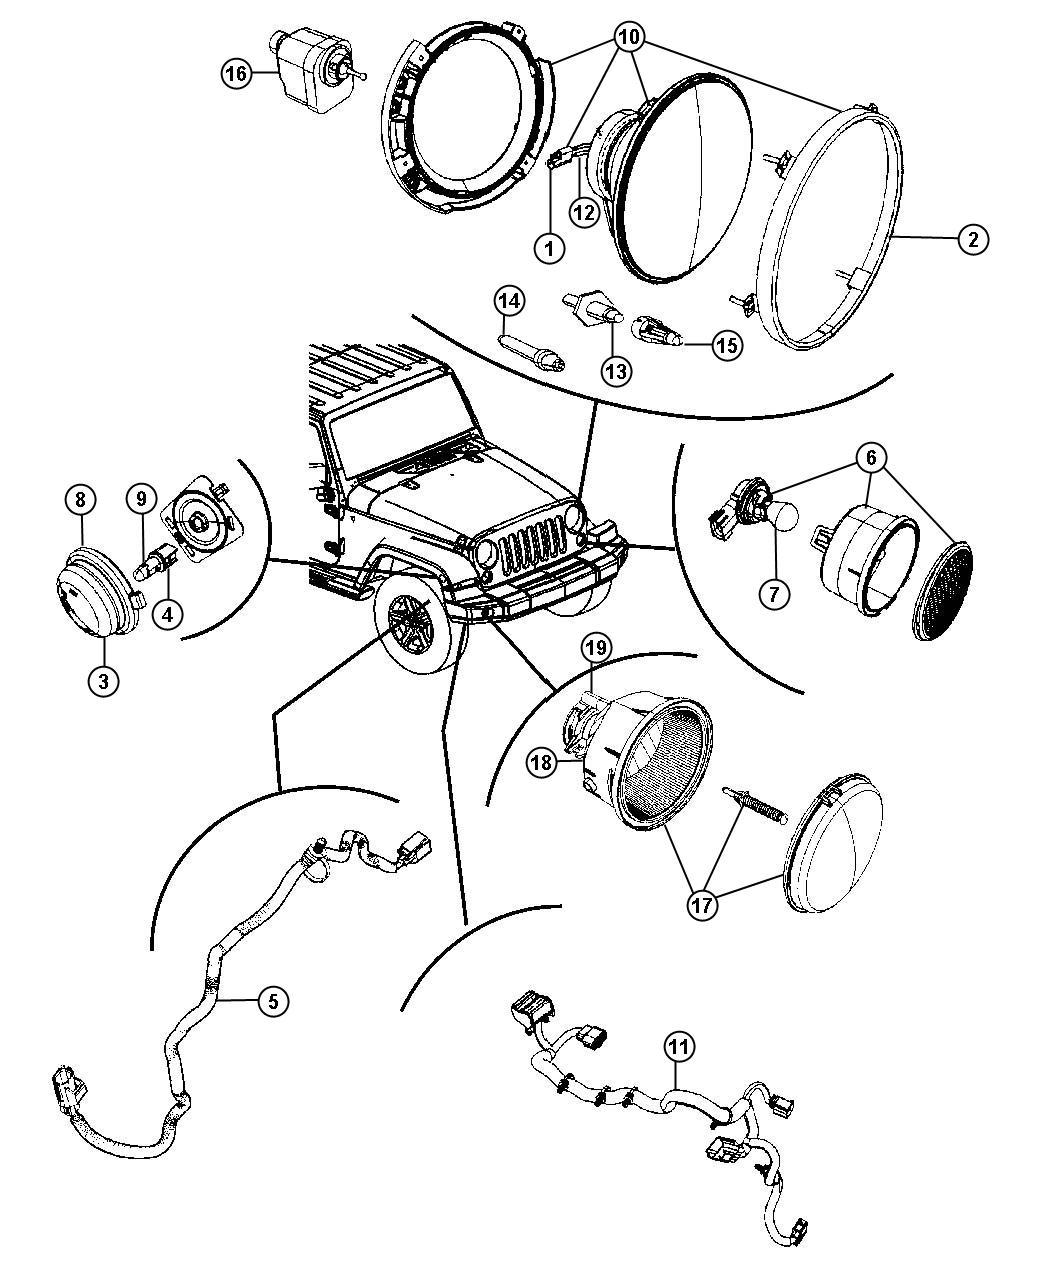 Jeep Wrangler Wiring. Headlamp. [remote start system